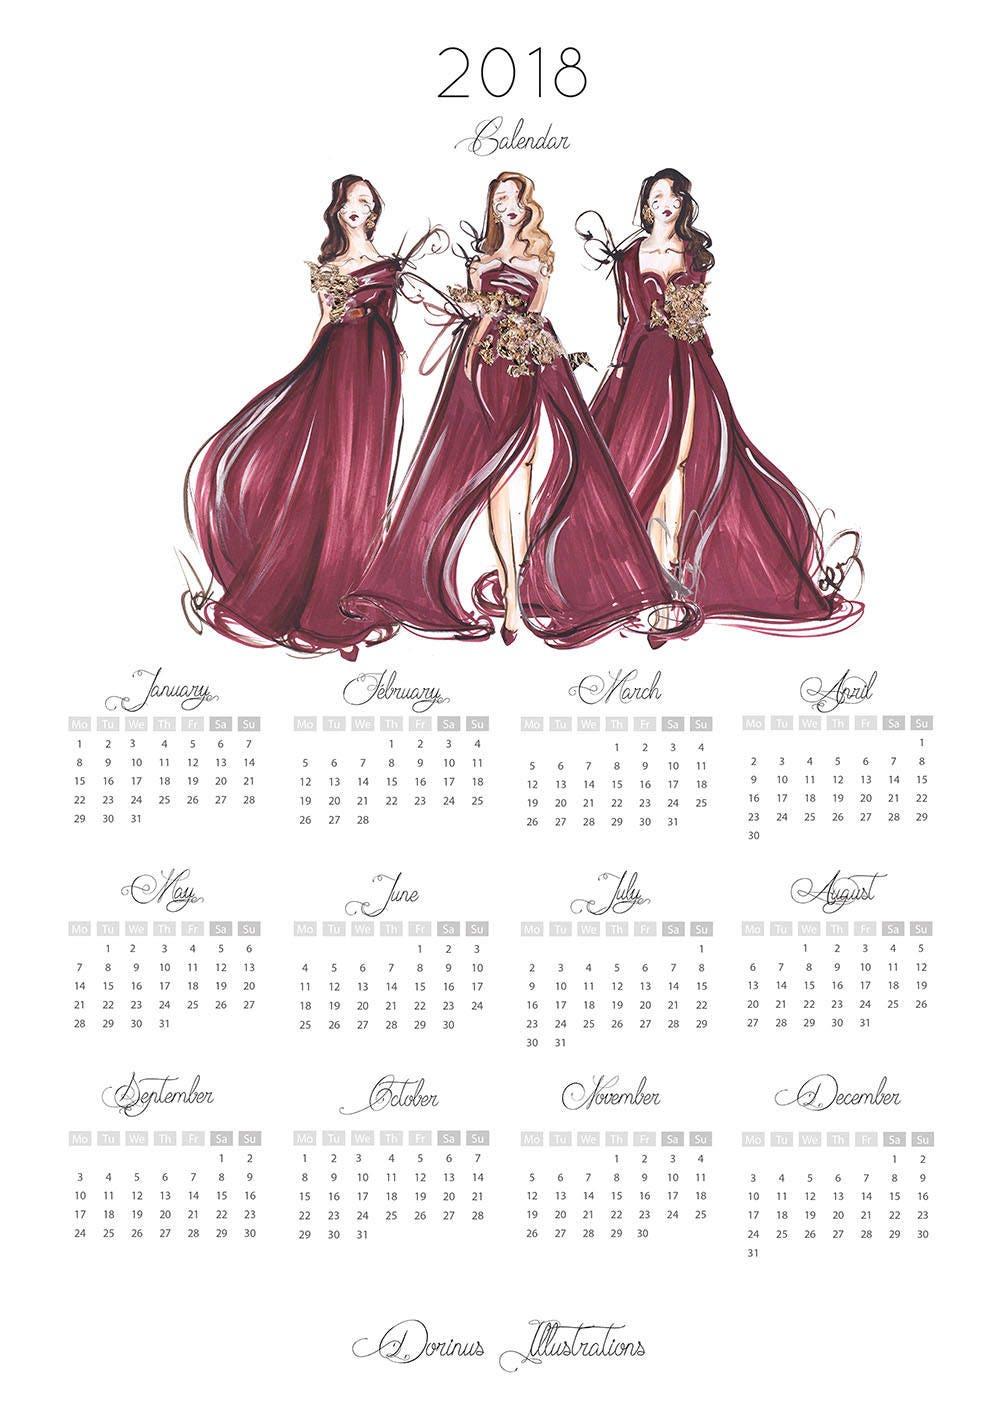 Fashion Illustration Calendar : Glance calendar fashion illustration